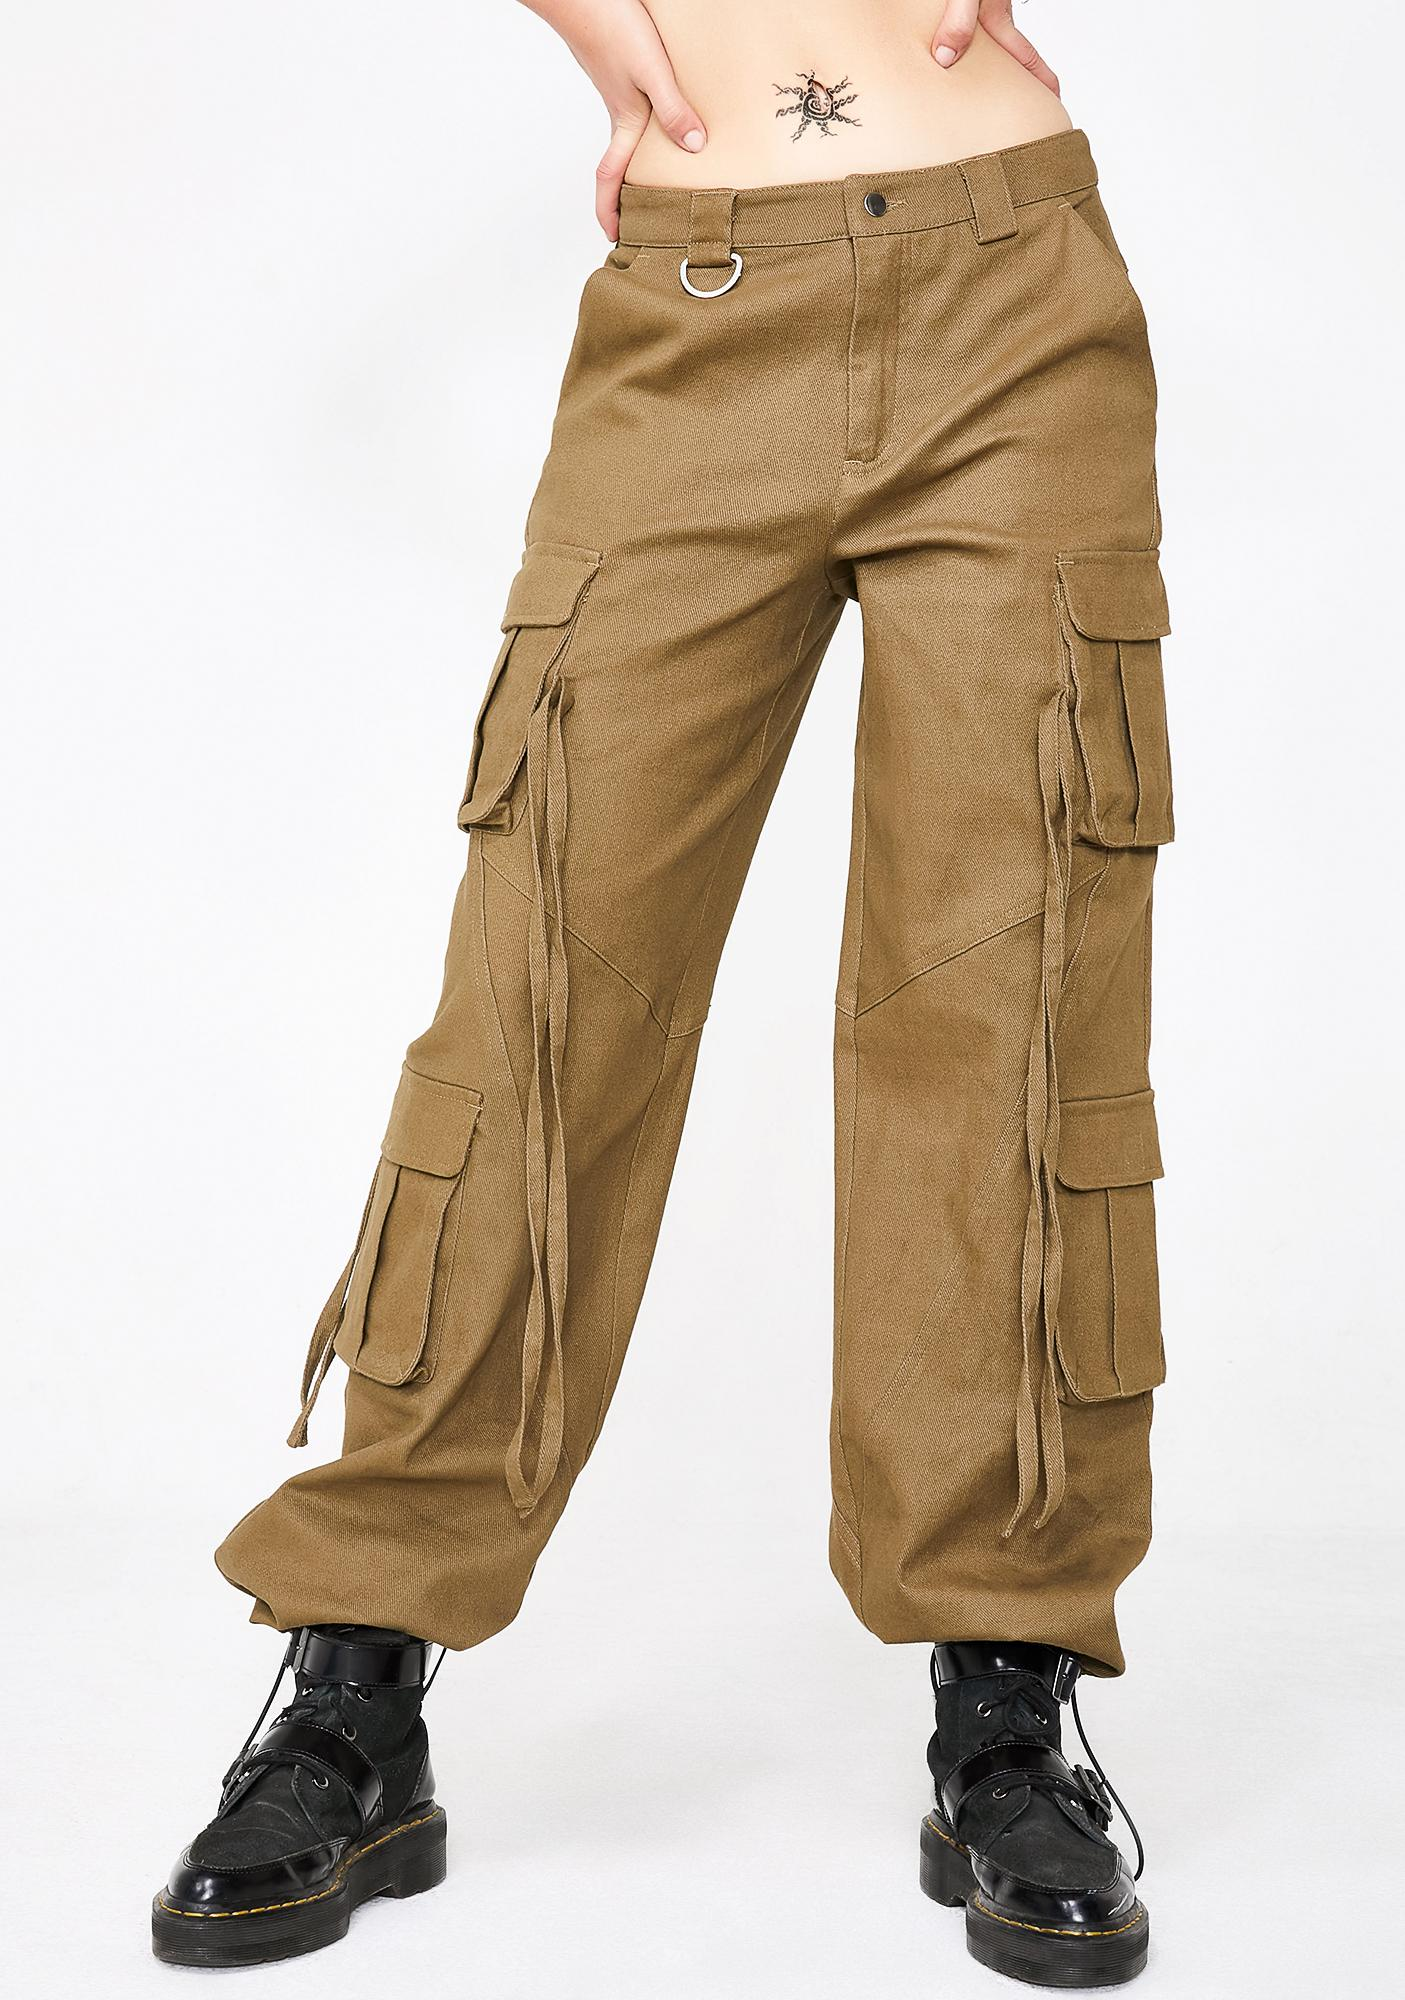 I AM GIA Altra Pants